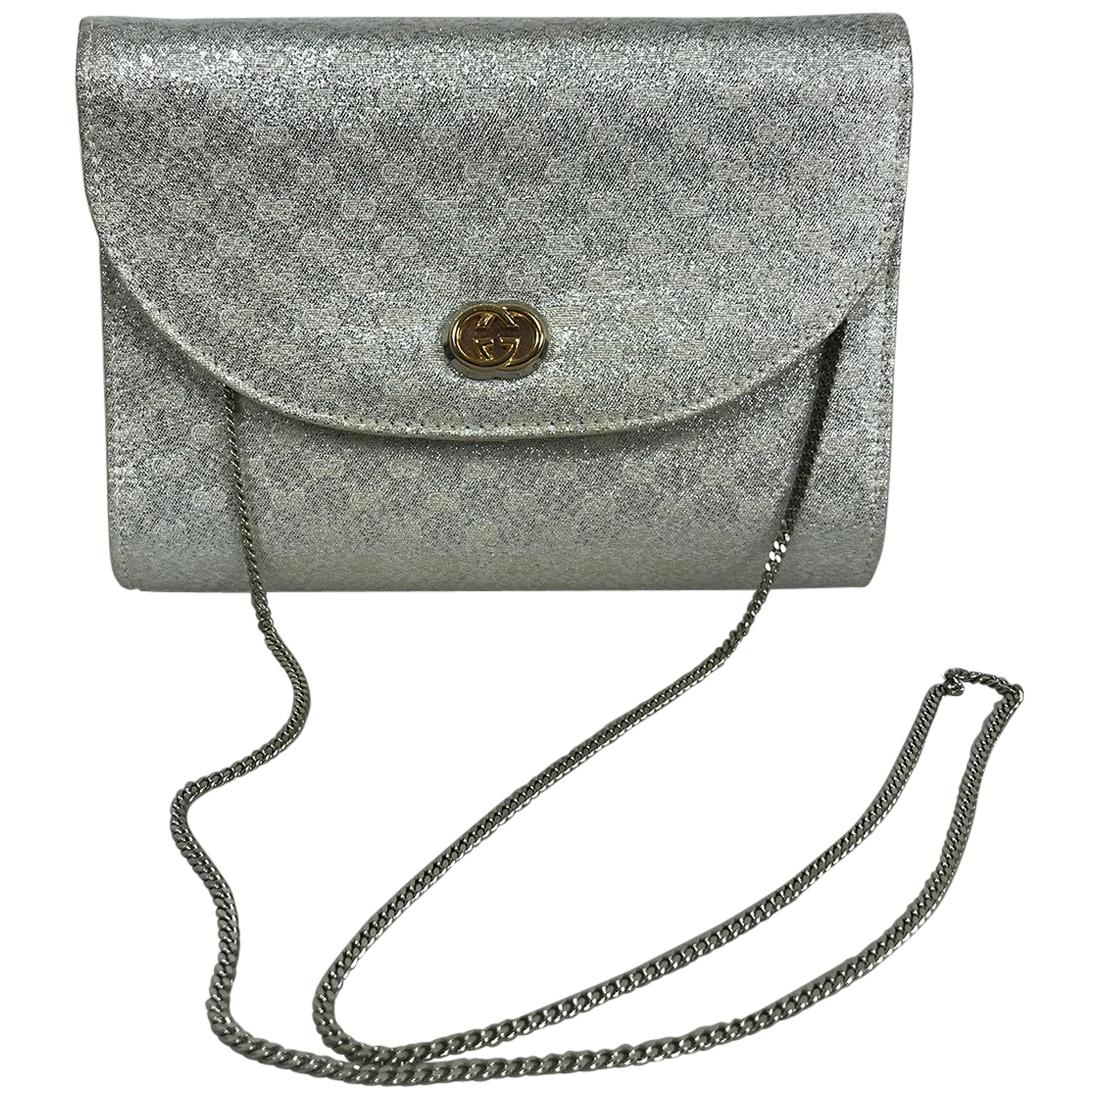 Gucci Silver Metallic Logo Evening Bag Shoulder Bag